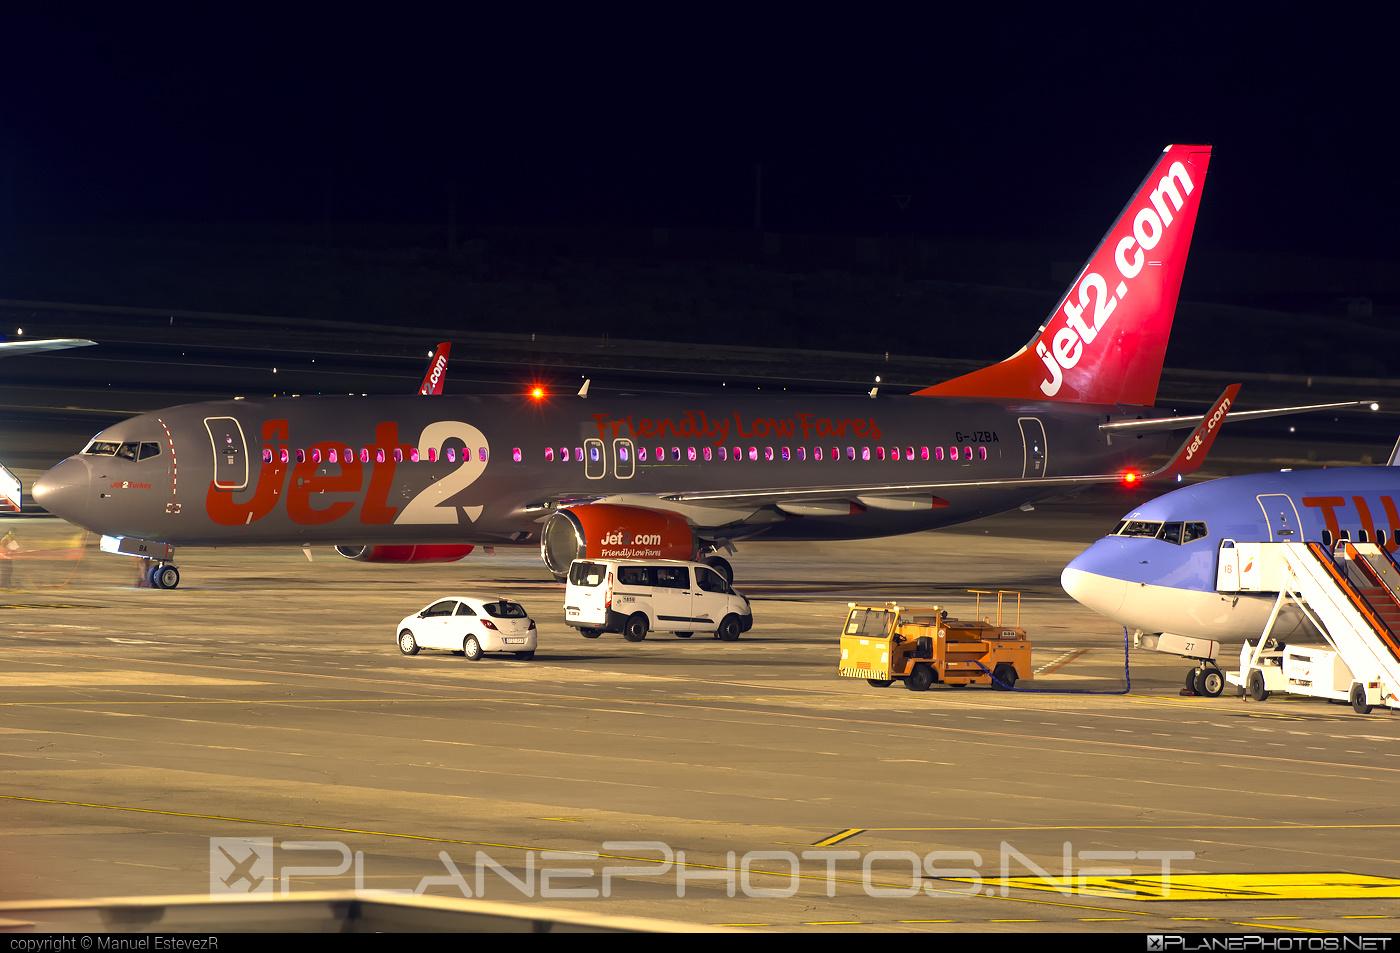 Boeing 737-800 - G-JZBA operated by Jet2 #b737 #b737nextgen #b737ng #boeing #boeing737 #jet2